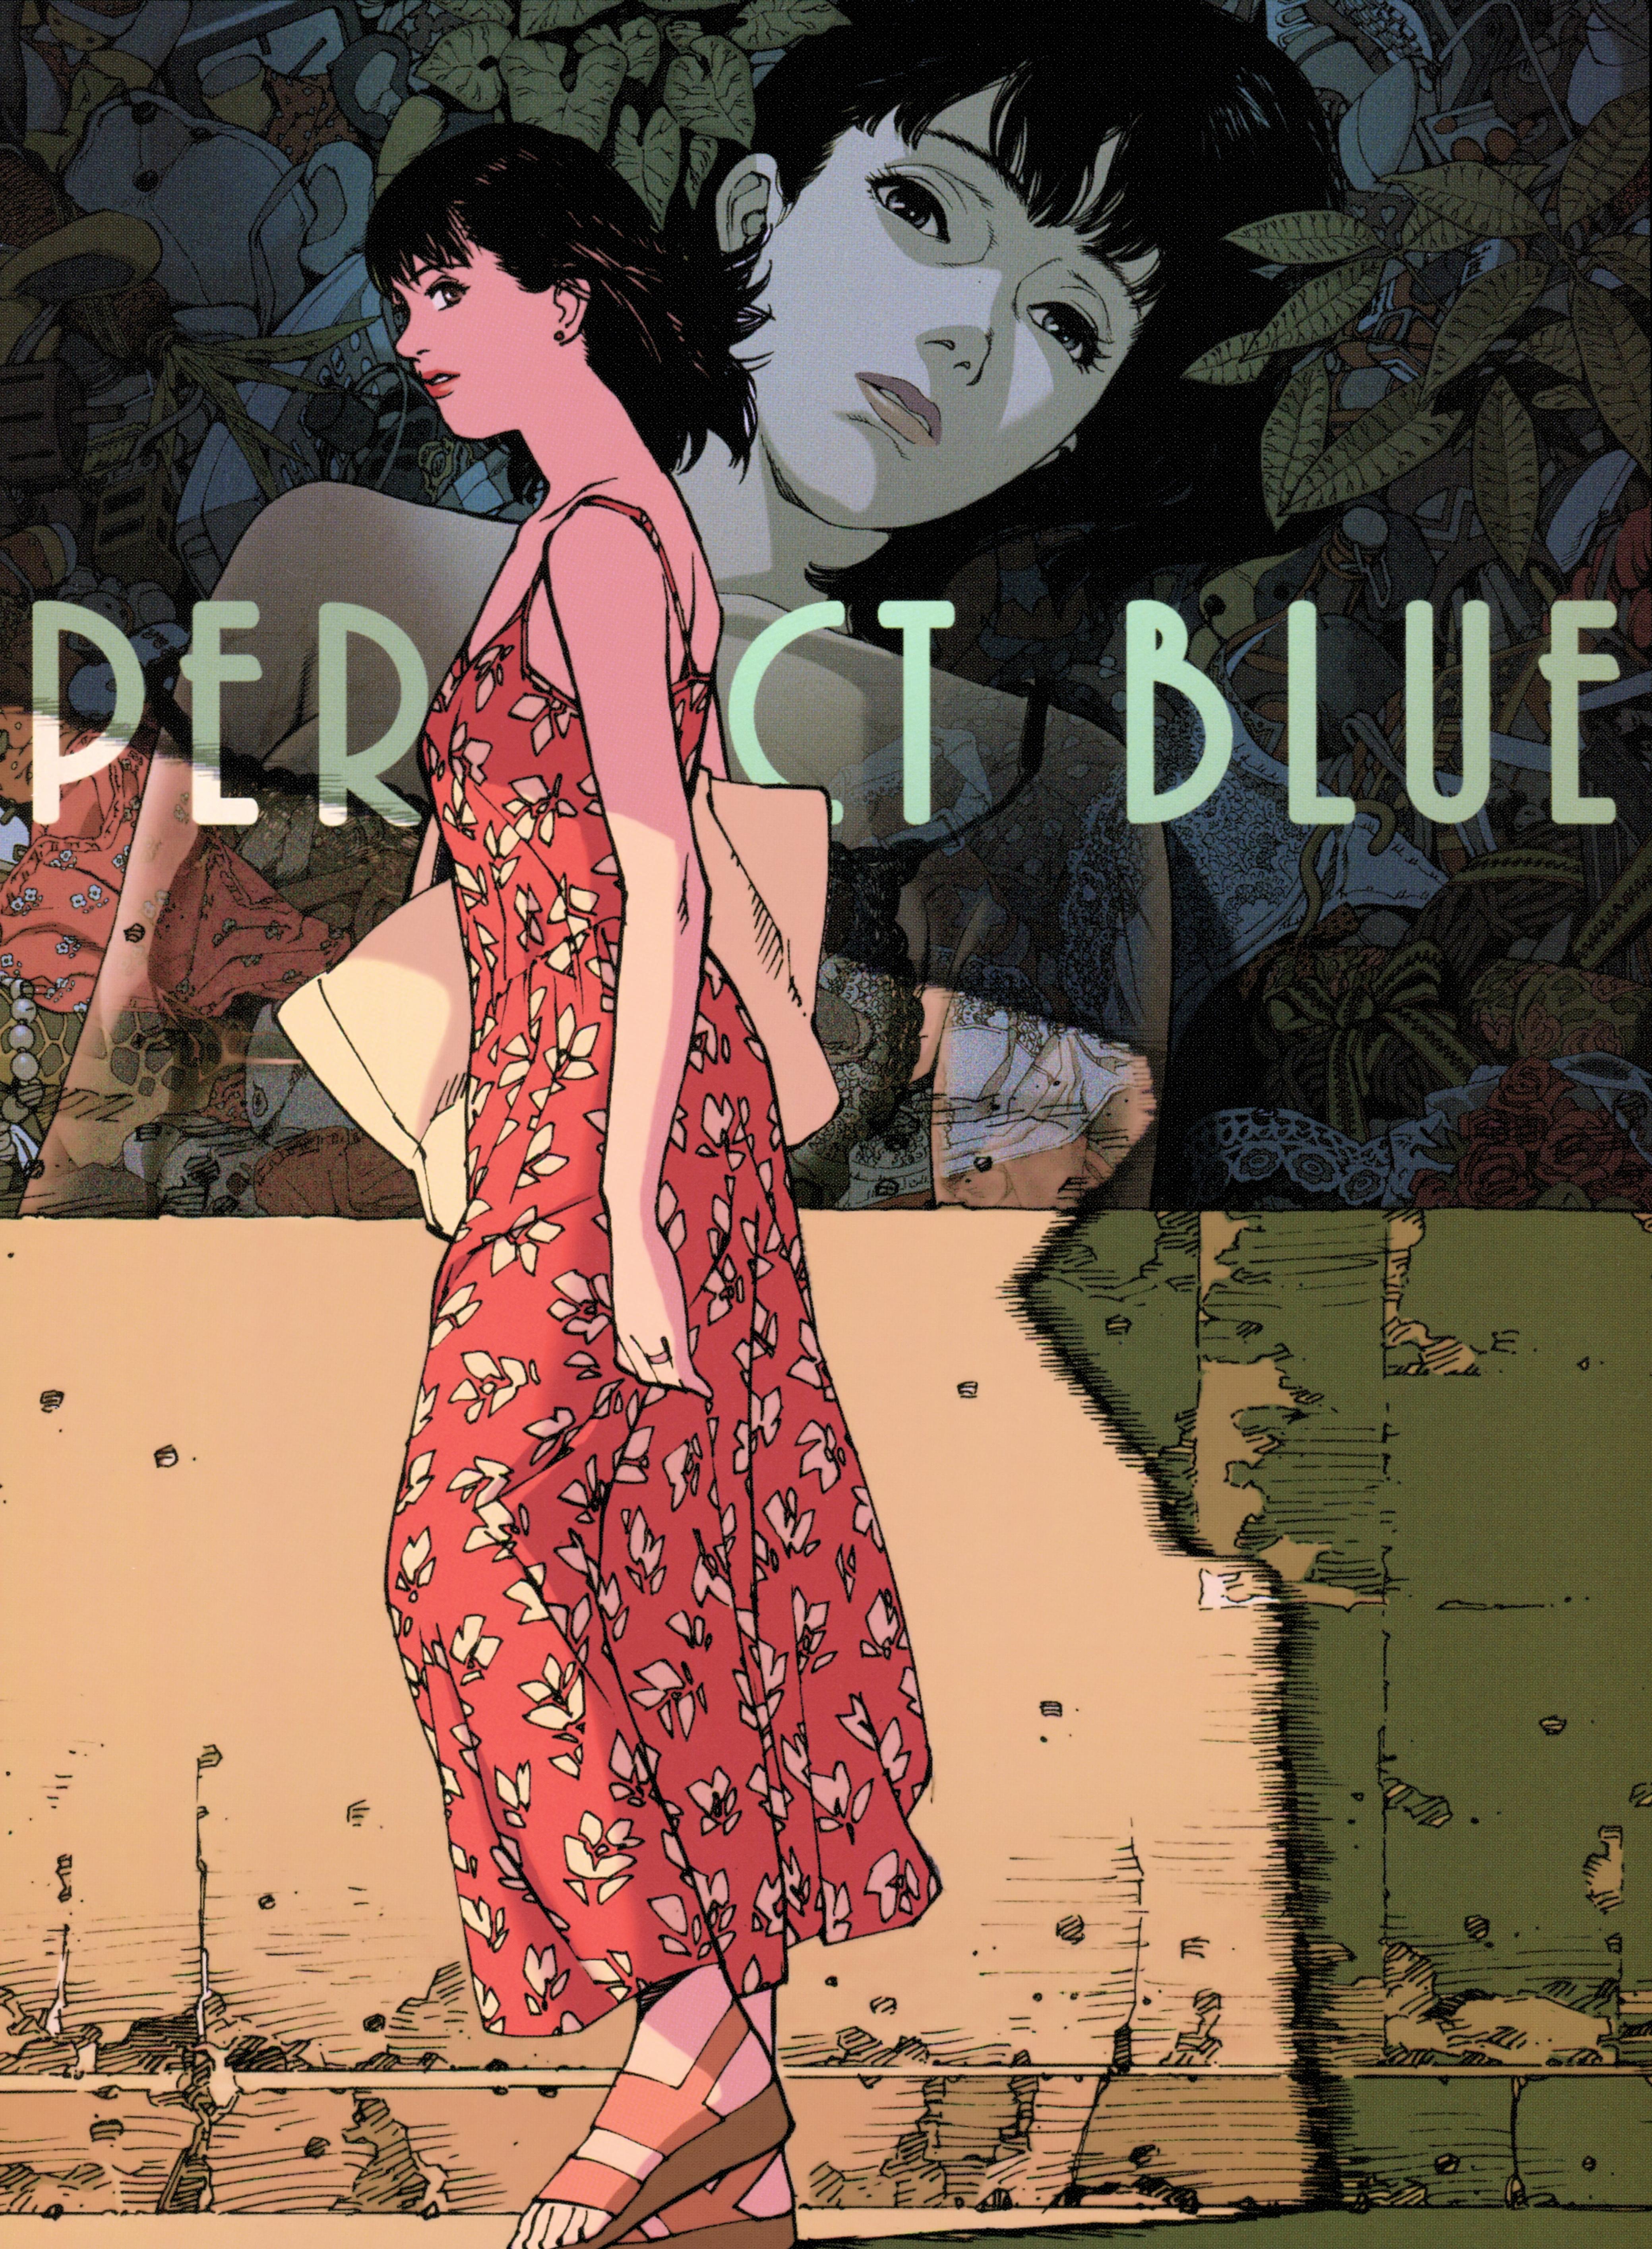 25 Perfect Blue Wallpapers On Wallpapersafari